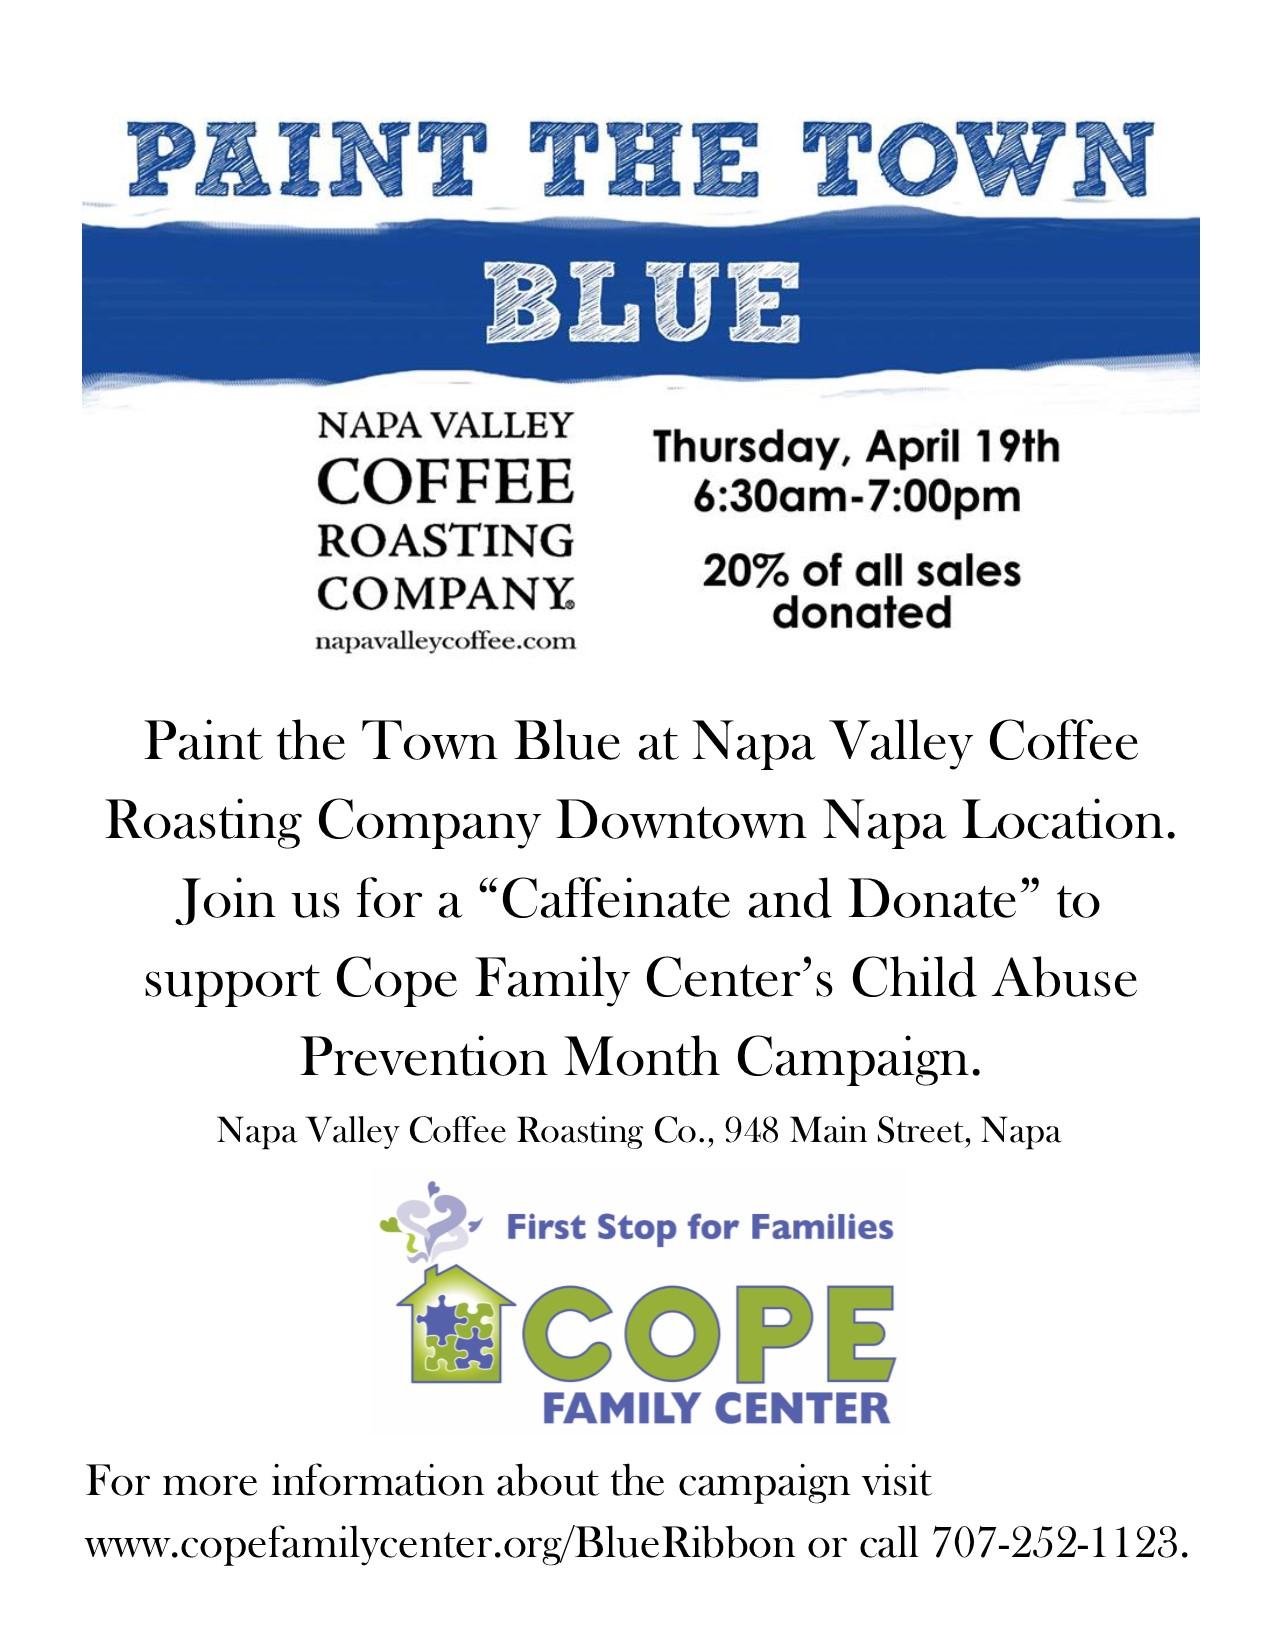 Cope Family Center Child Abuse Prevention